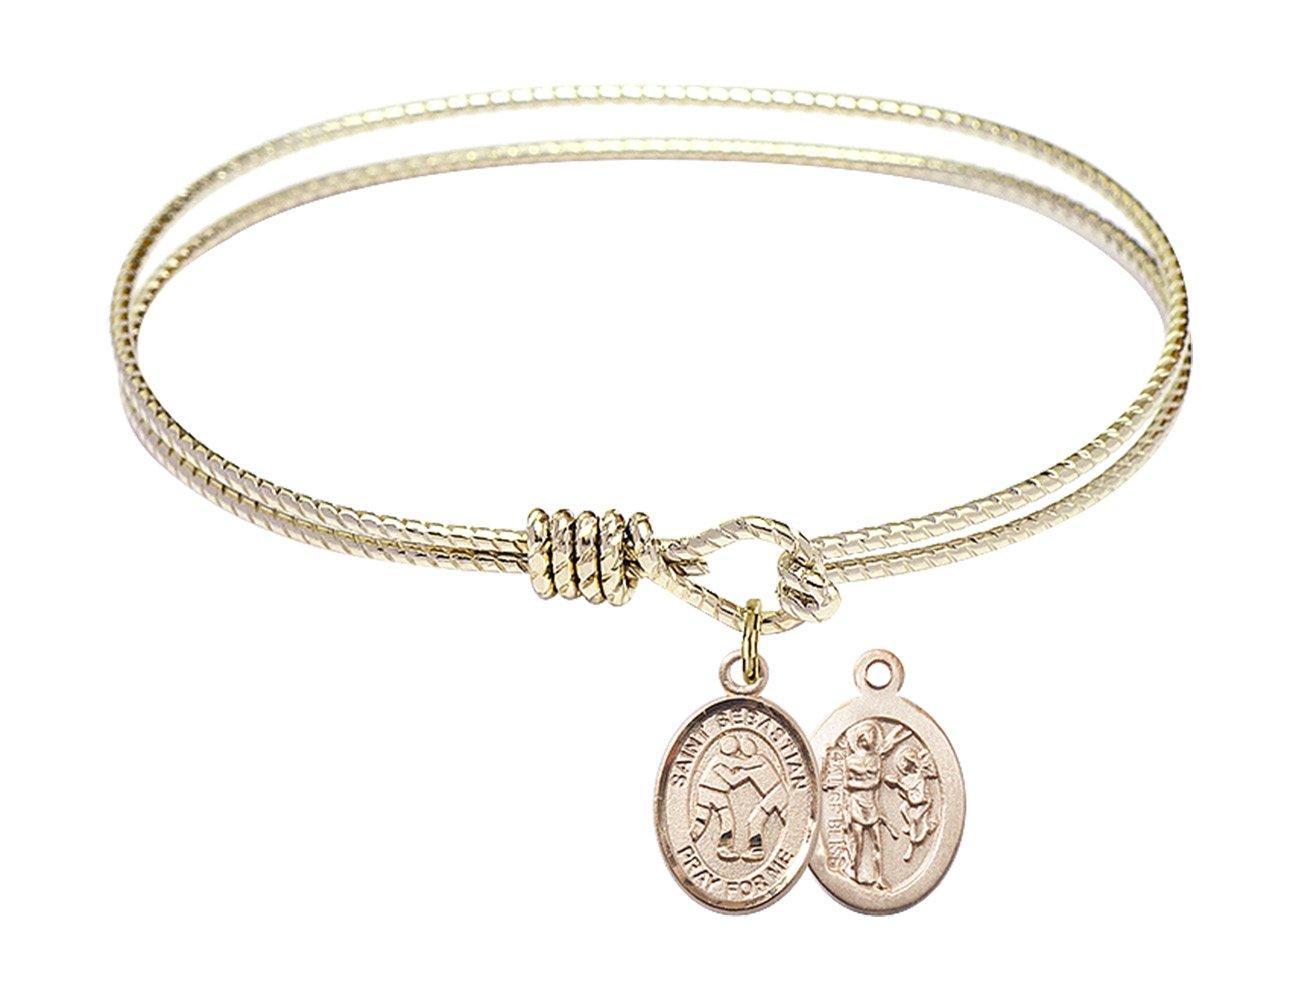 6 1/4 inch Oval Eye Hook Bangle Bracelet with a St. Sebastian/Wrestling charm.